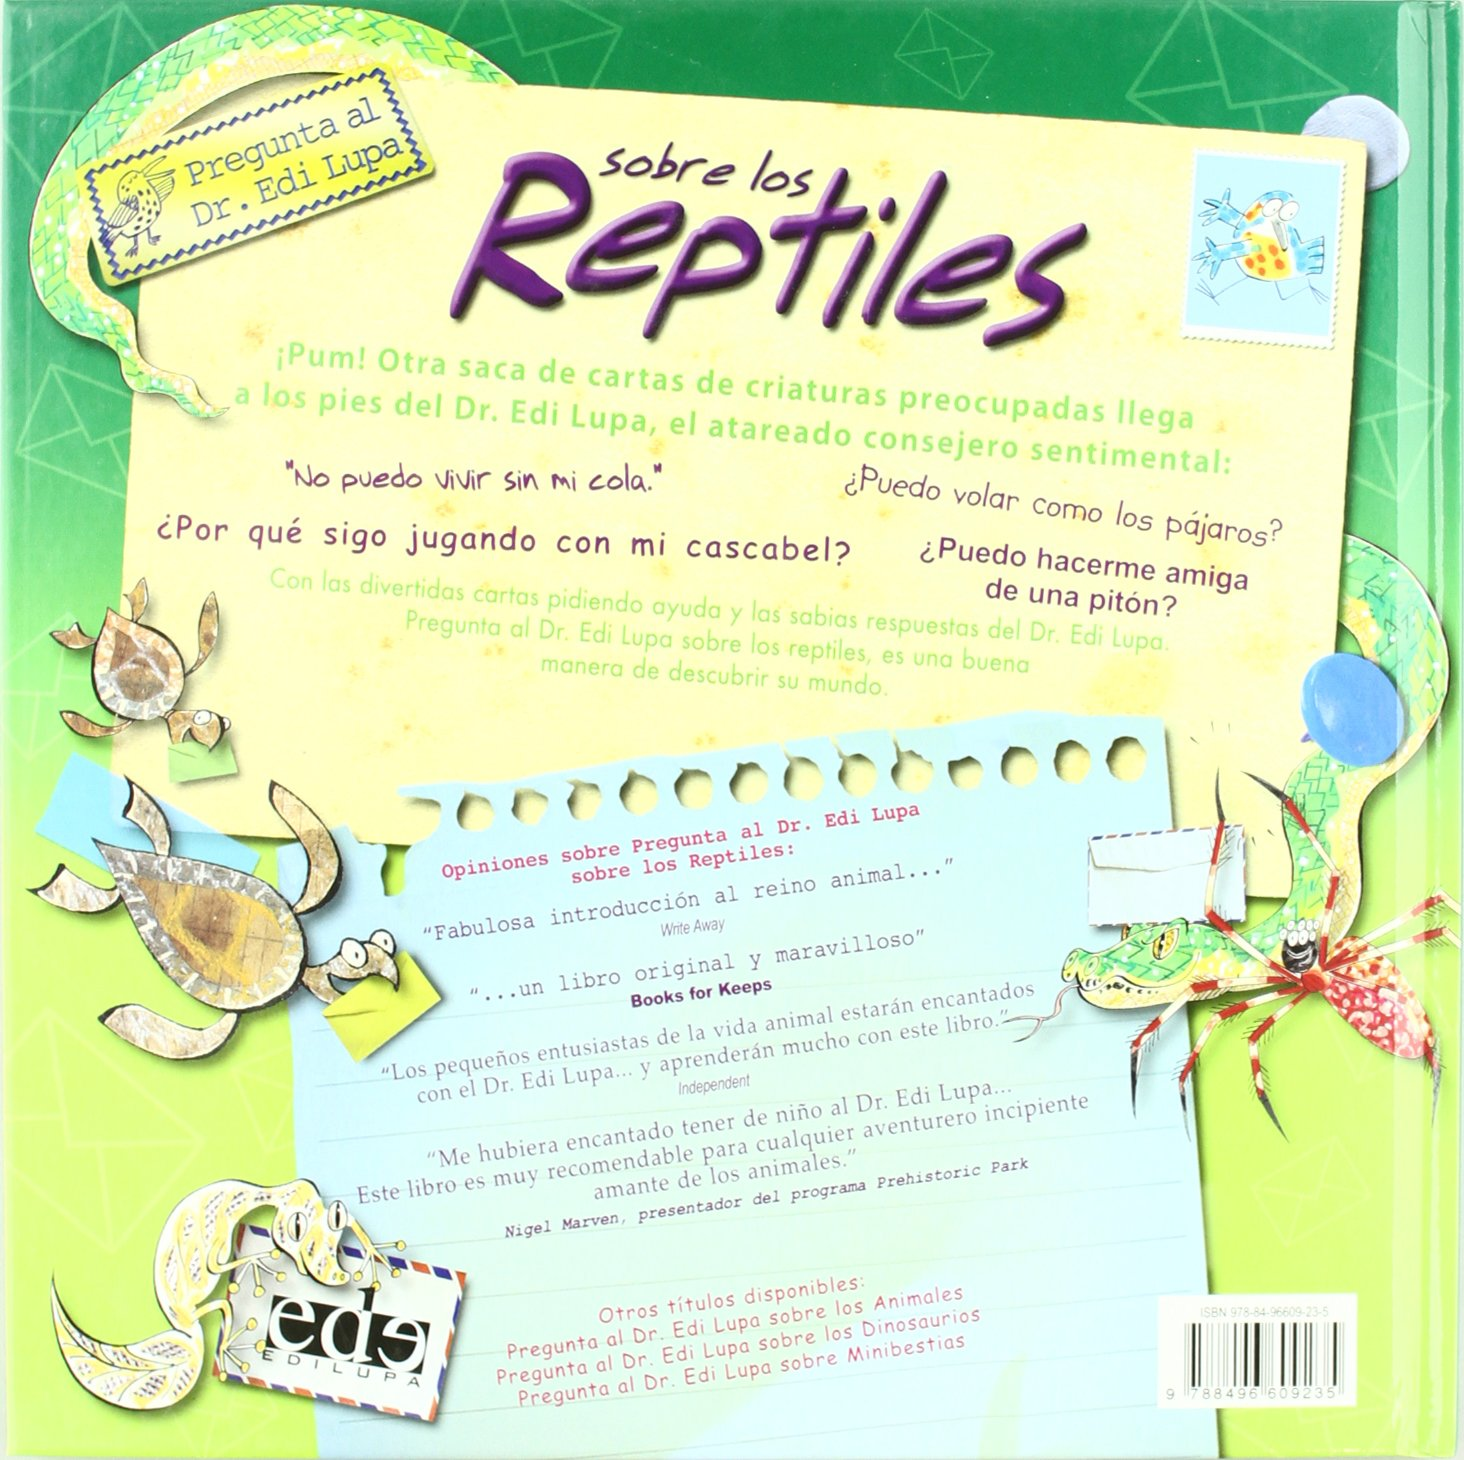 Pregunta al Dr Edi Lupa acerca de los reptiles: CLAIRE ...